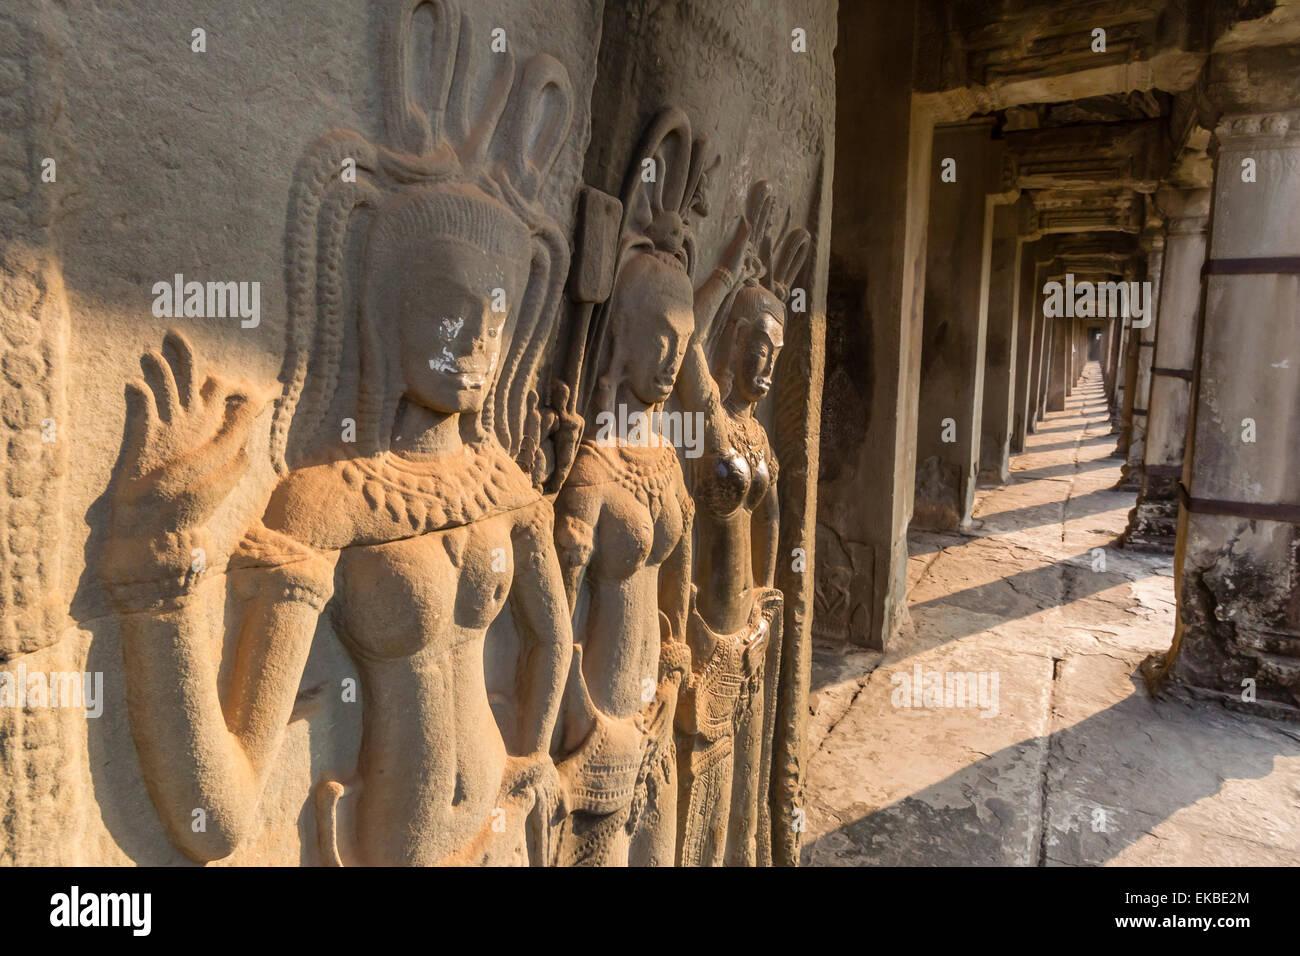 Bas-relief carvings of Apsara, Angkor Wat, Angkor, UNESCO, Siem Reap, Cambodia, Indochina, Southeast Asia, Asia - Stock Image